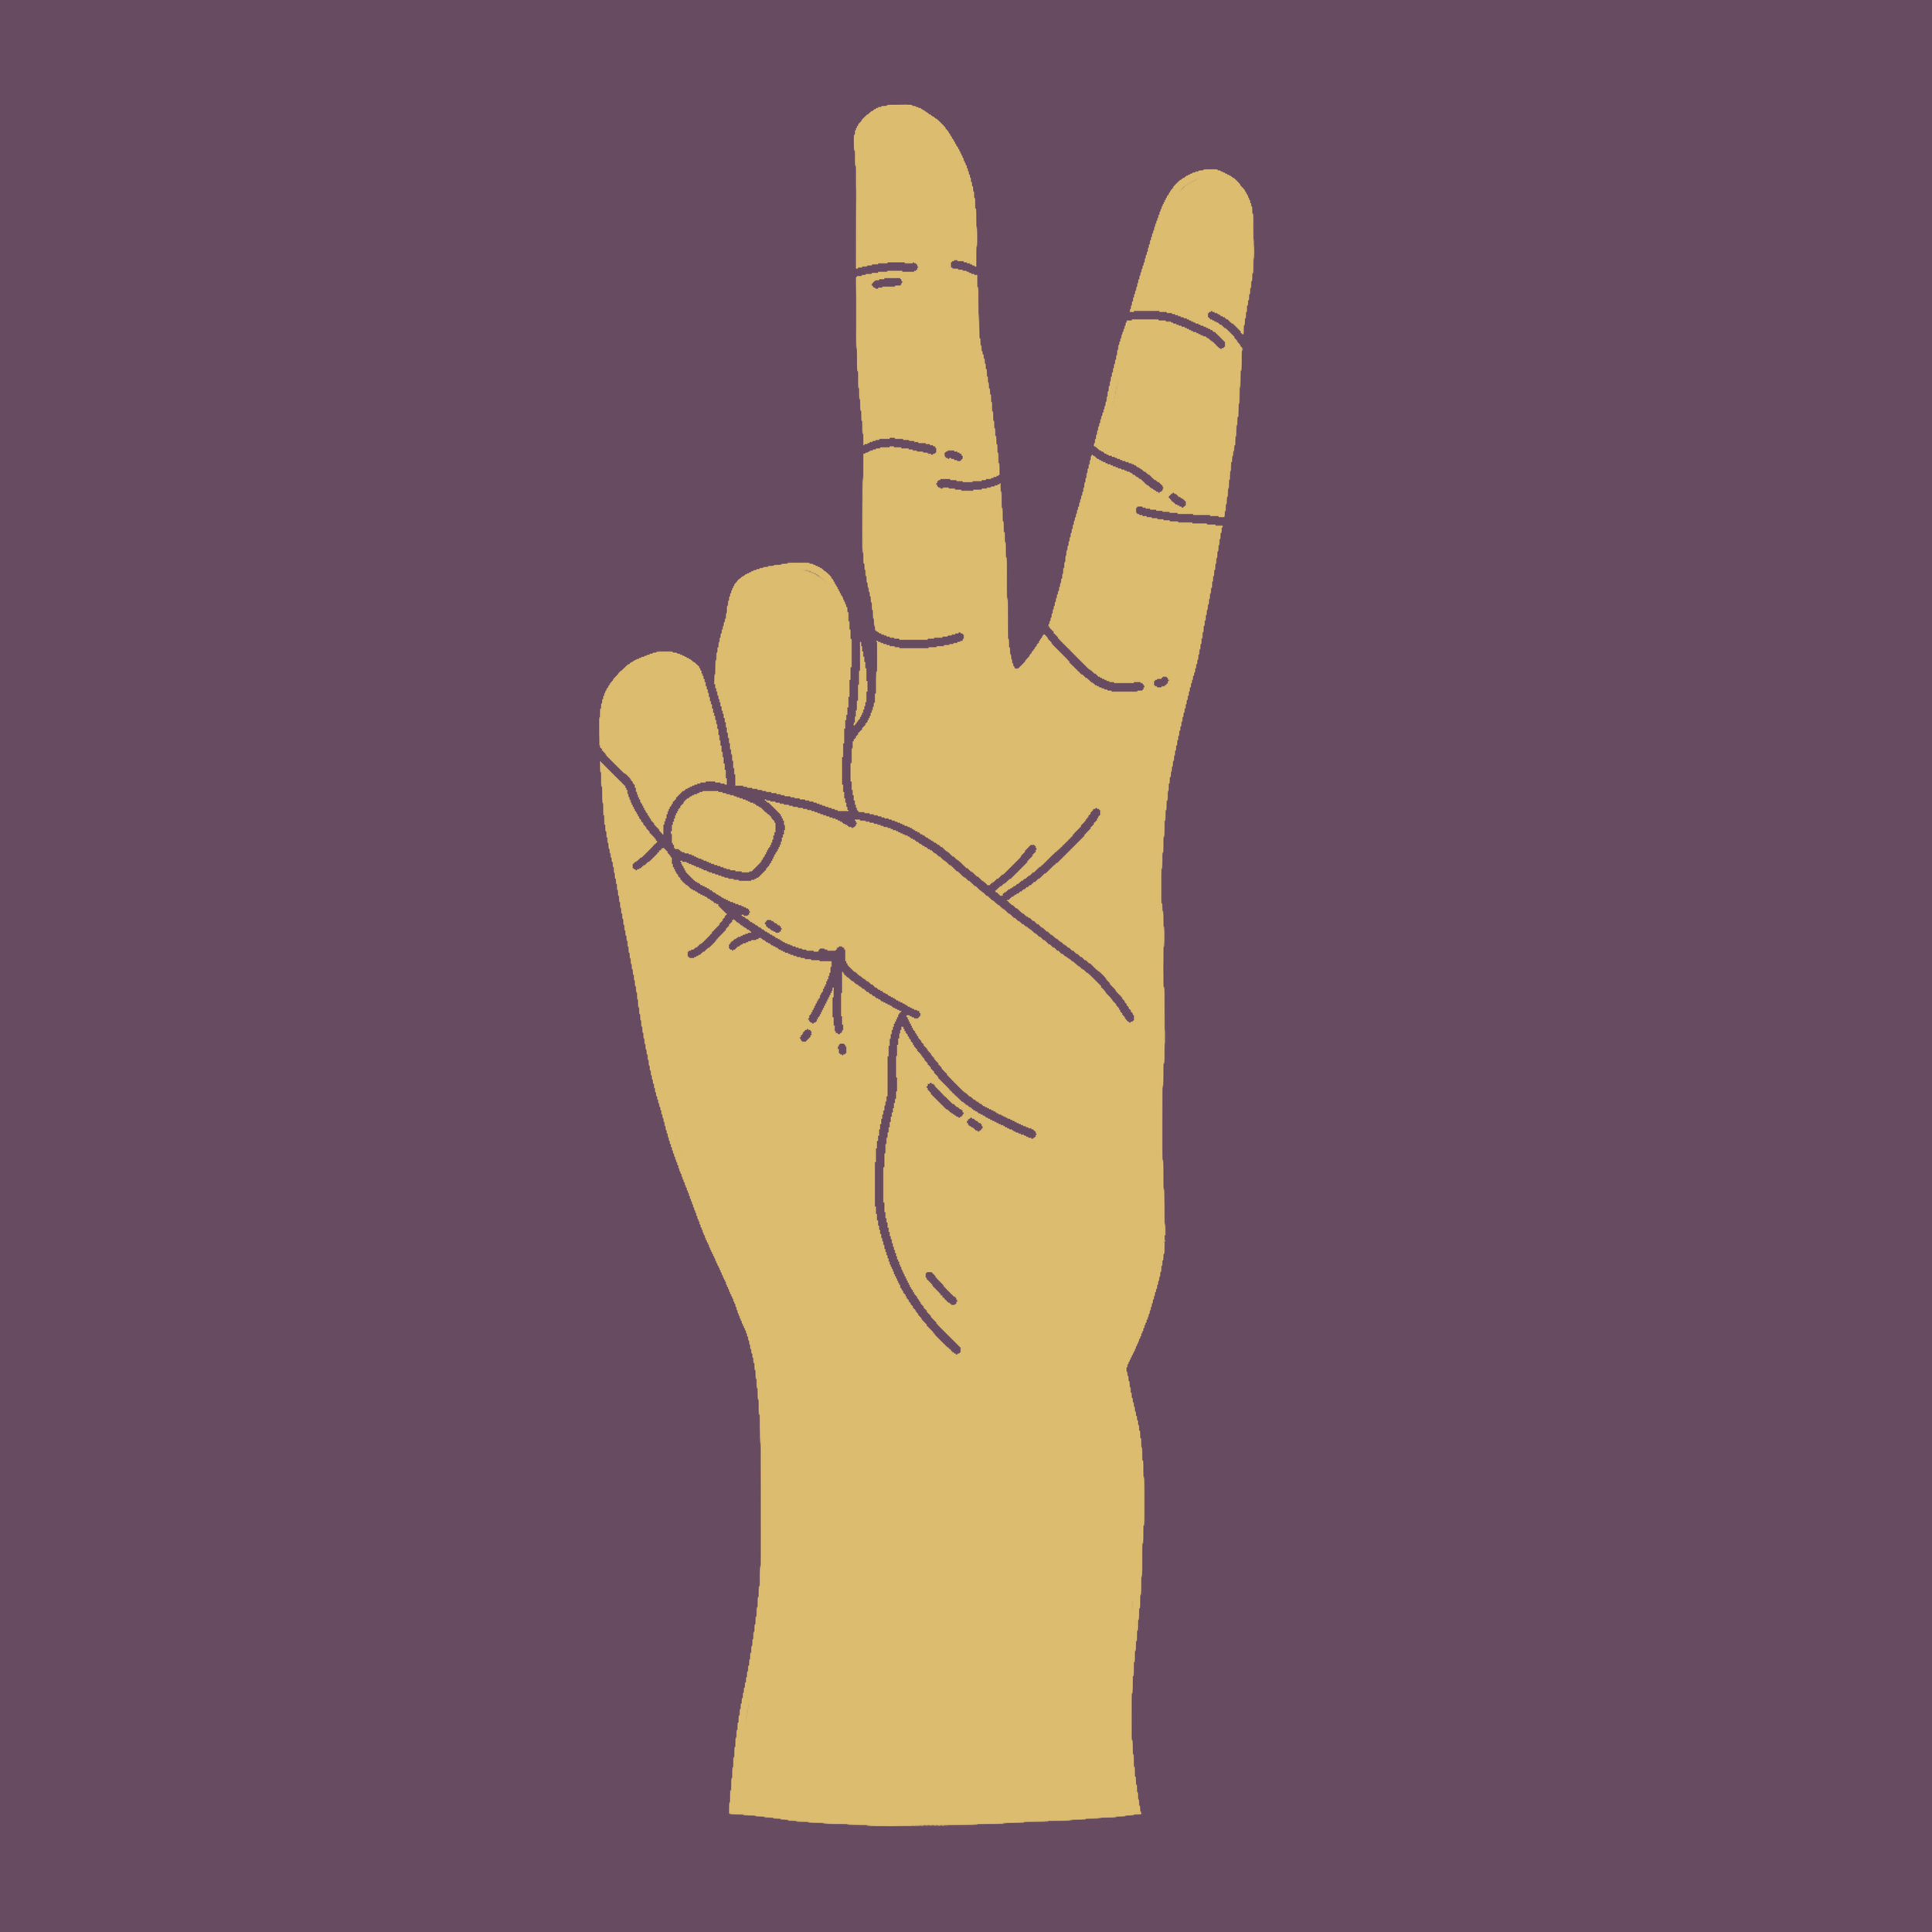 HAND_4.jpg